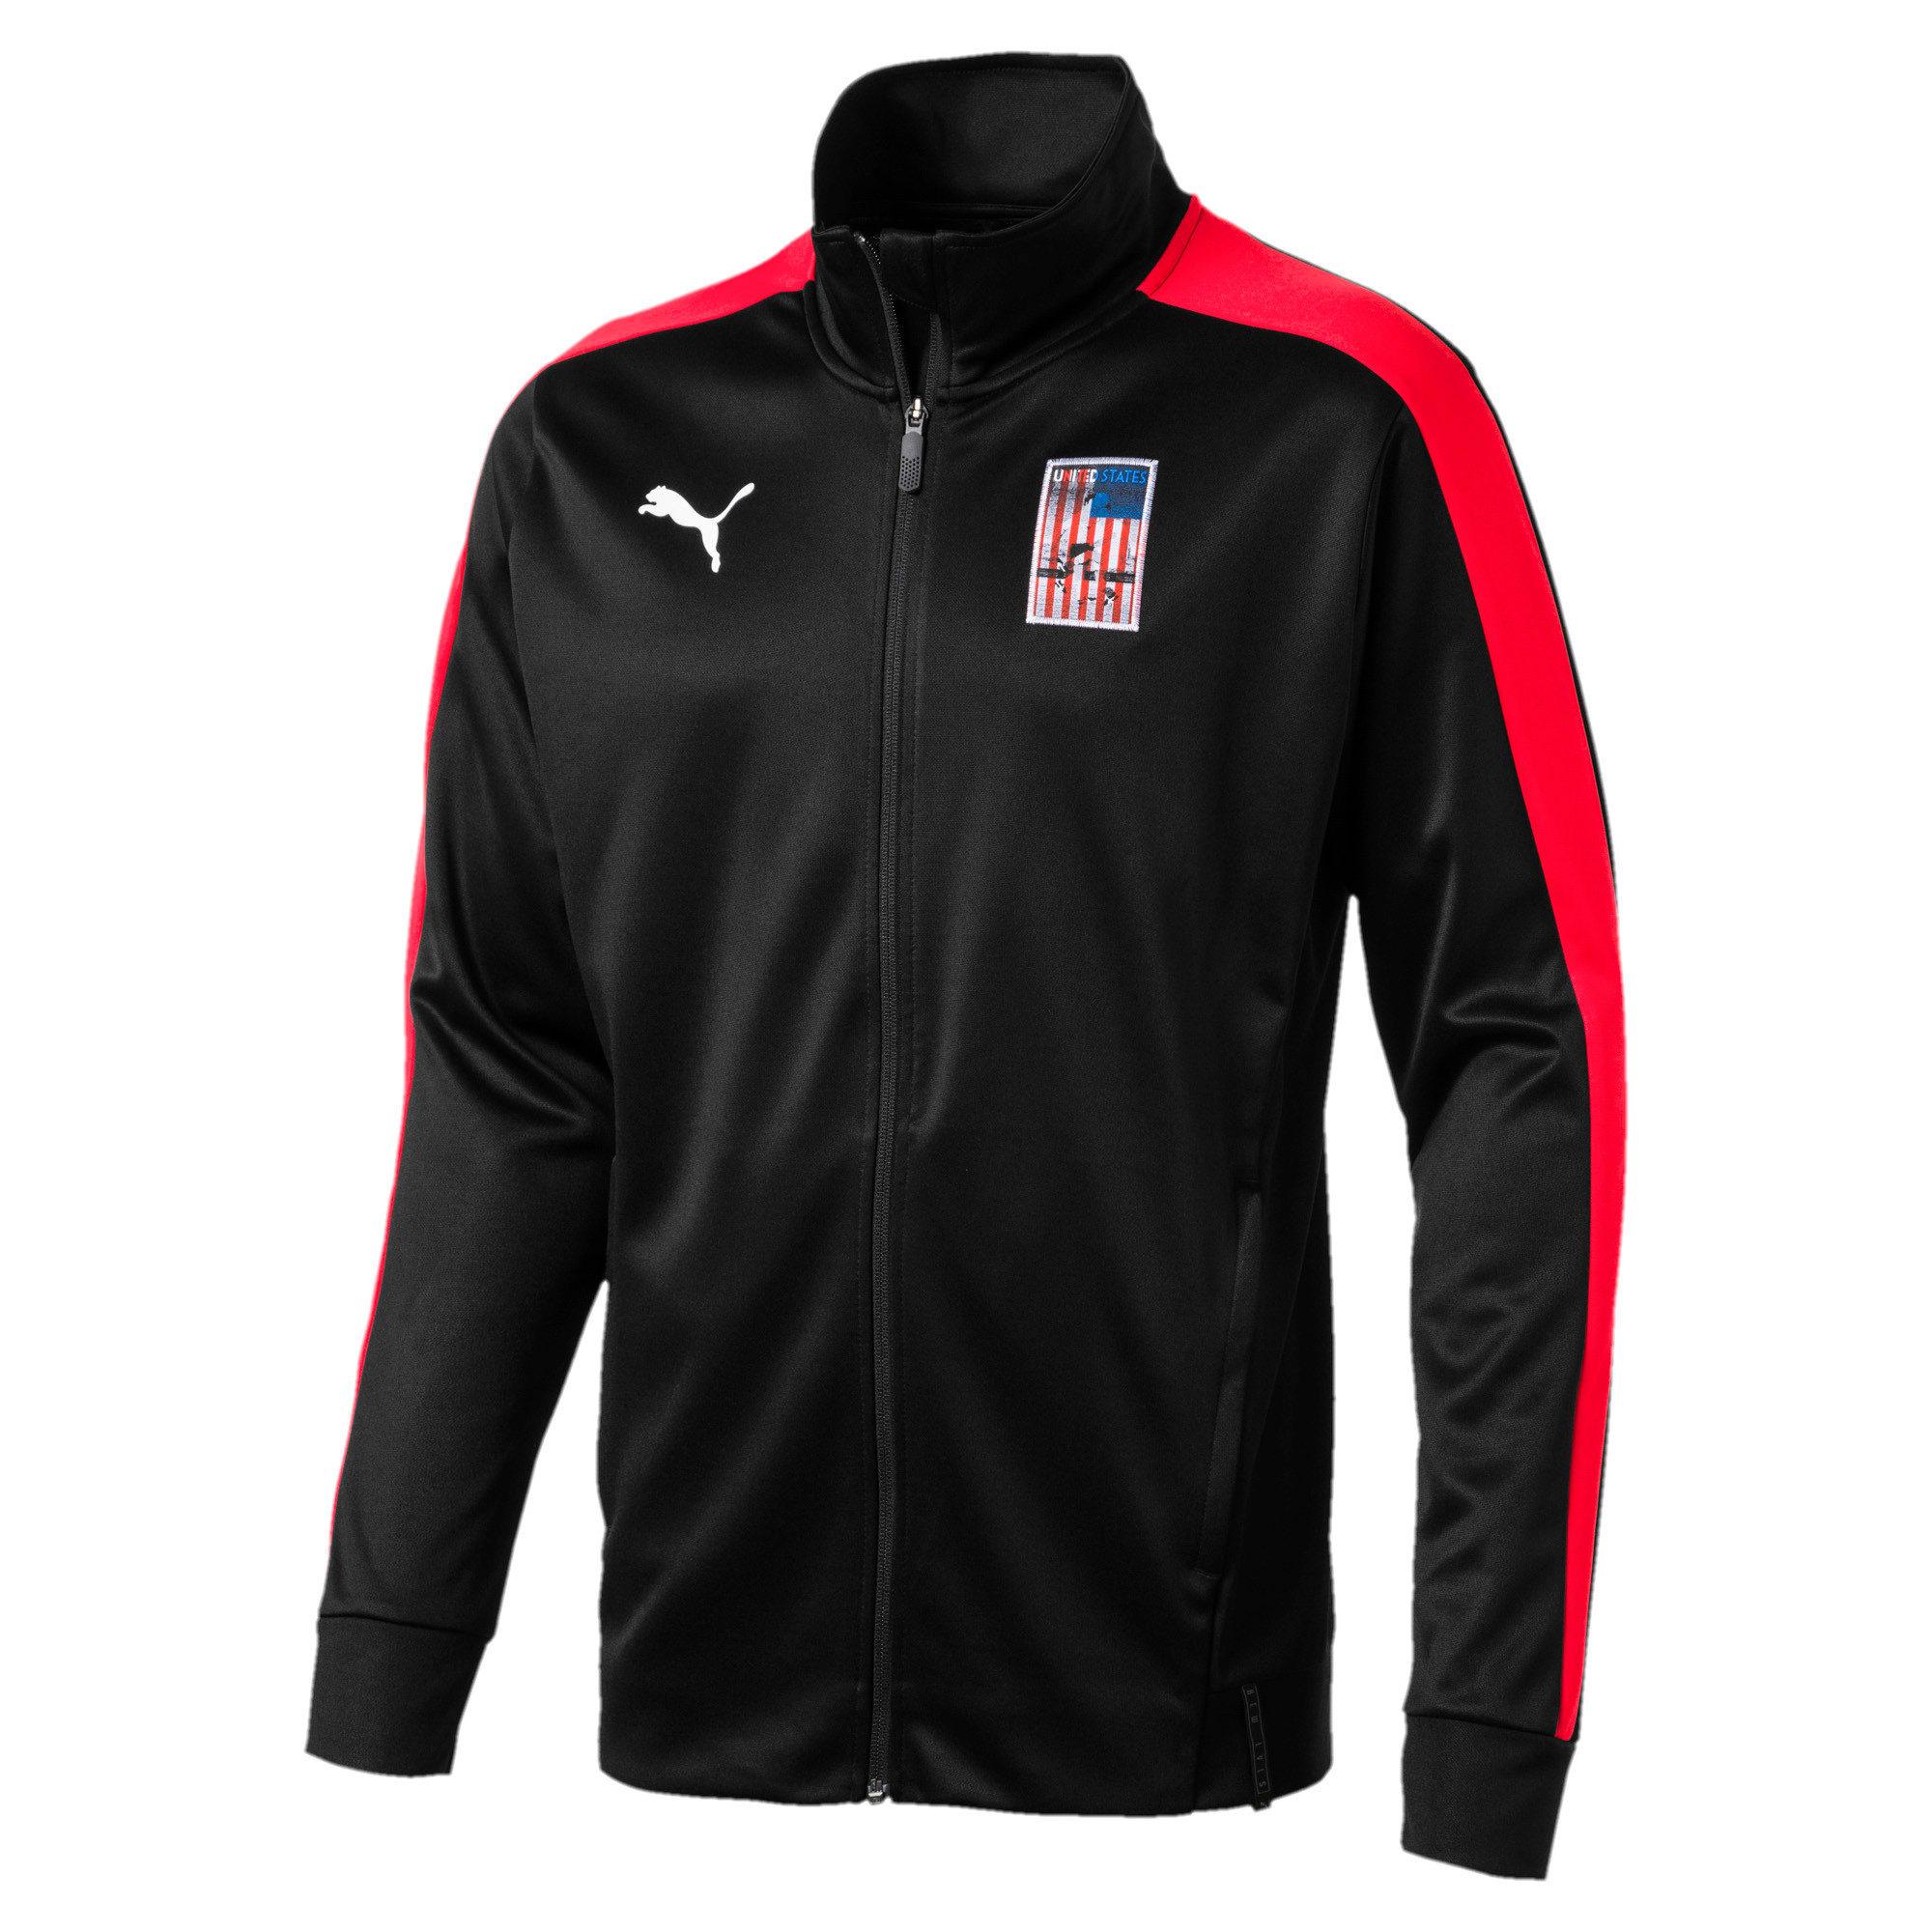 Thumbnail 2 of Copa America Men's T7 Track Jacket, Puma Black-Puma Red, medium